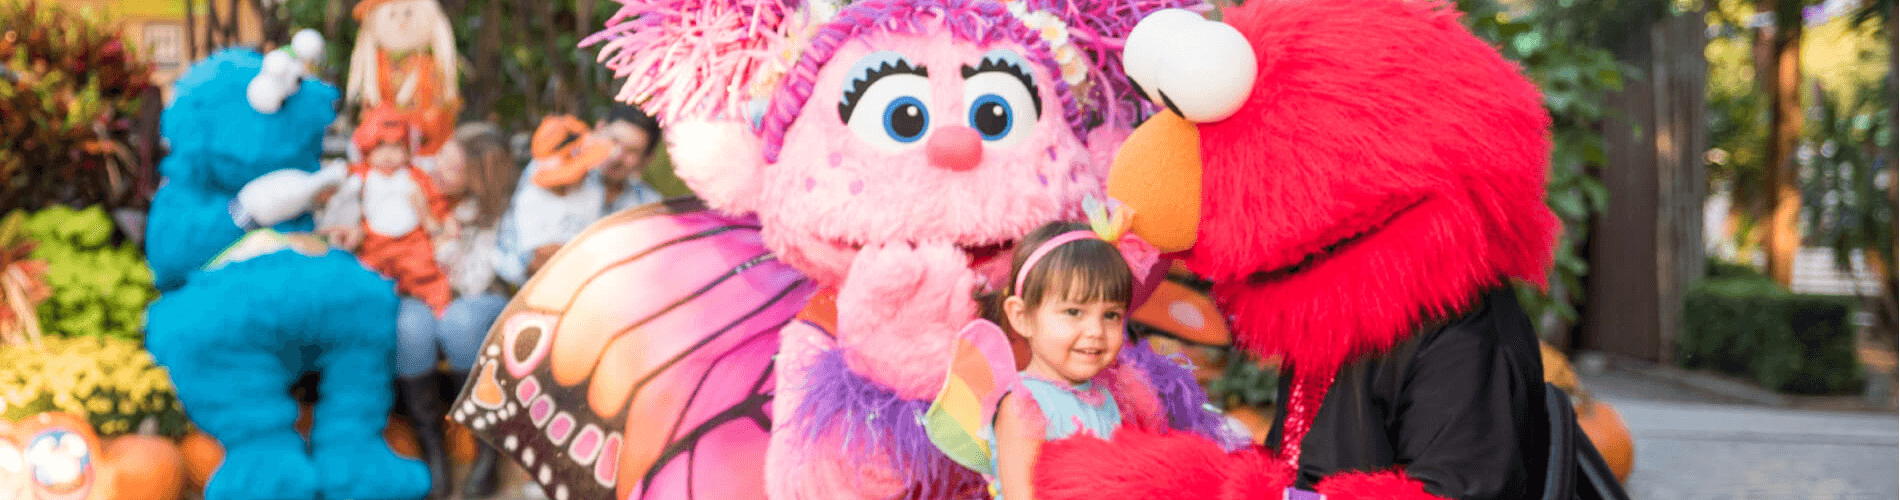 Sesame Street Safari of Fun kids weekends press kit